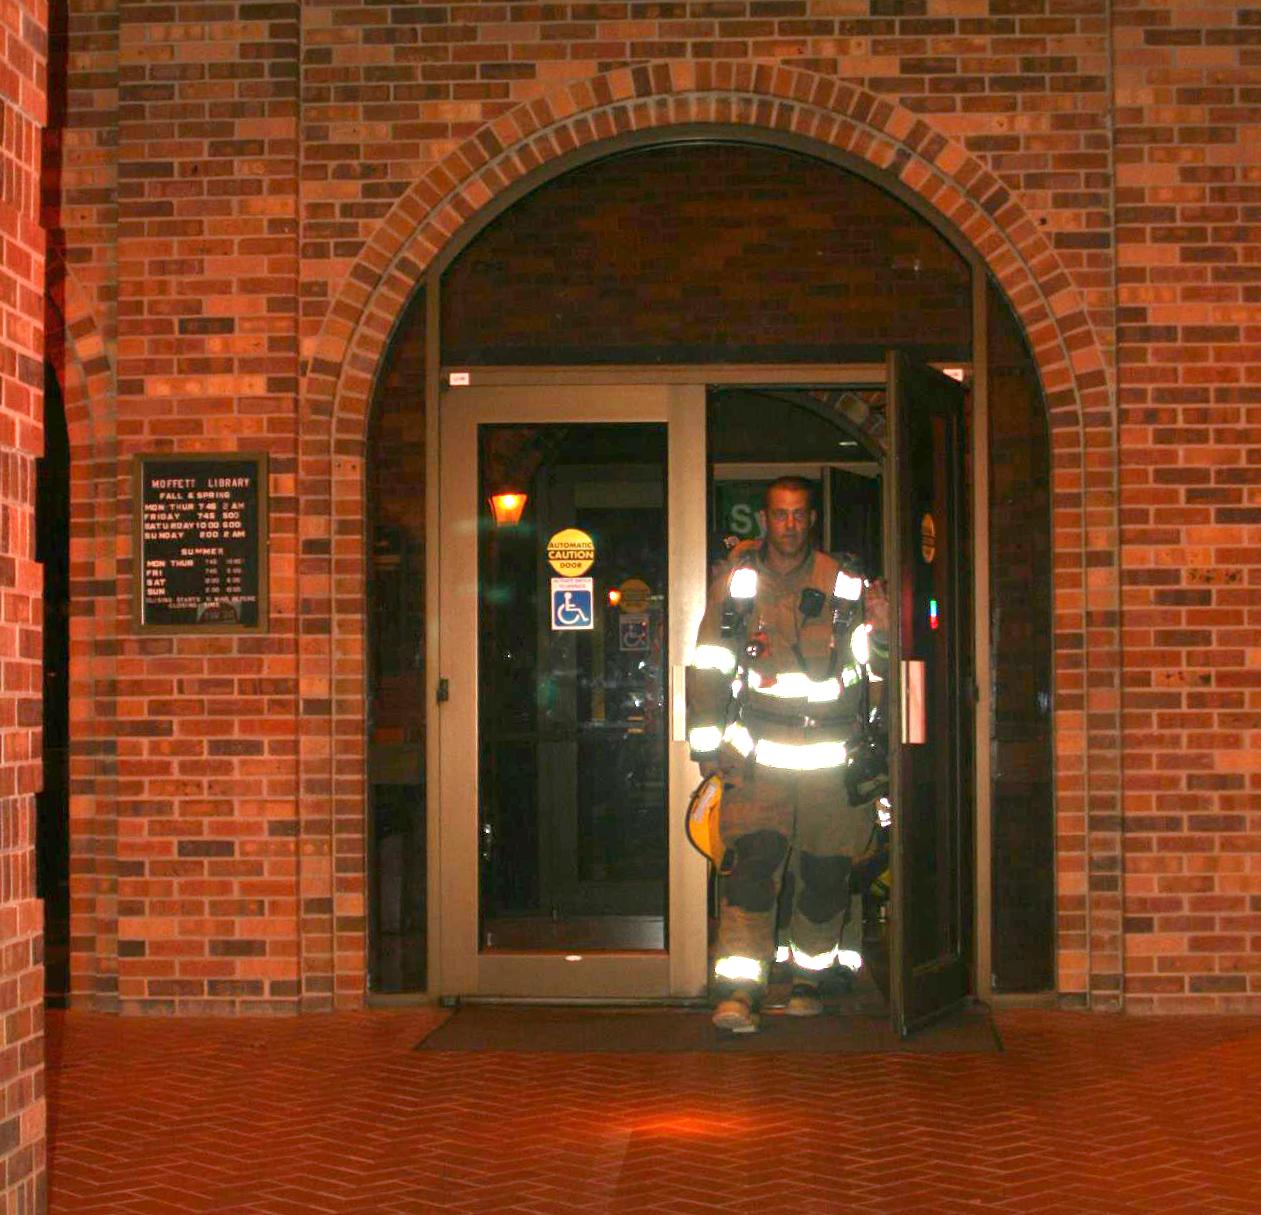 Smoke in Moffett library raises commotion